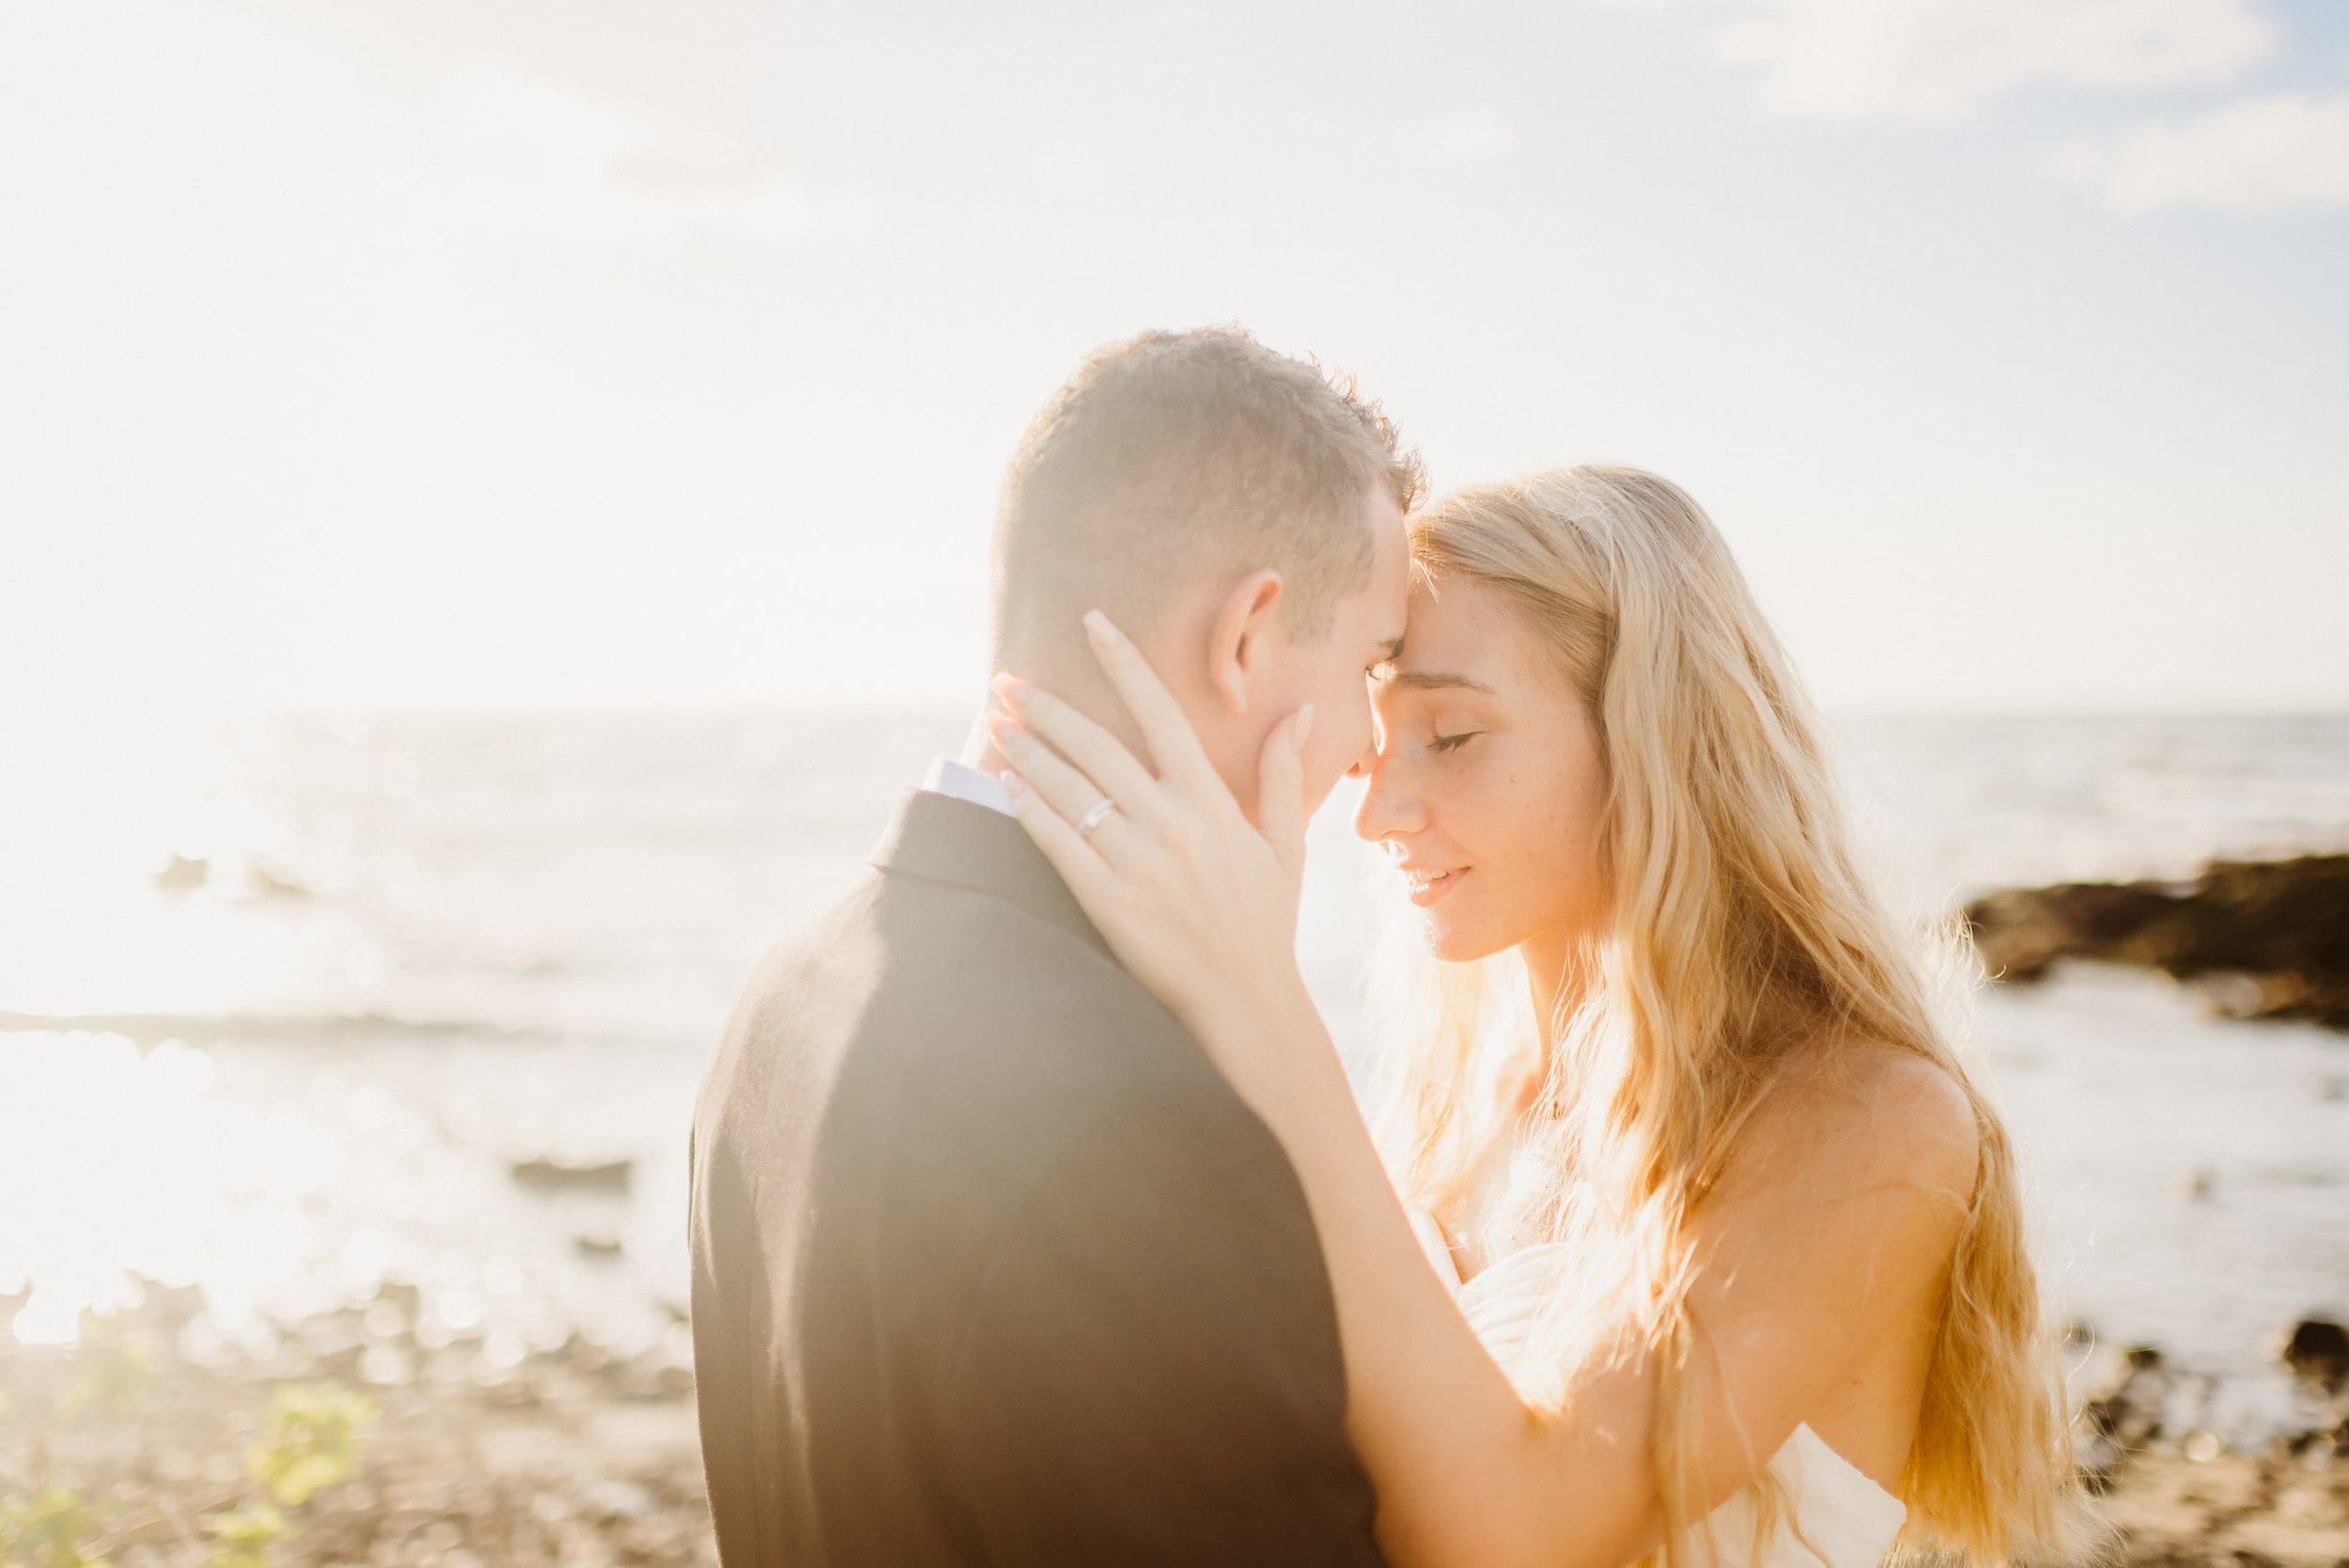 Big-Island-Elopement-Private-Wedding-Hawaii-Beach-01.jpg